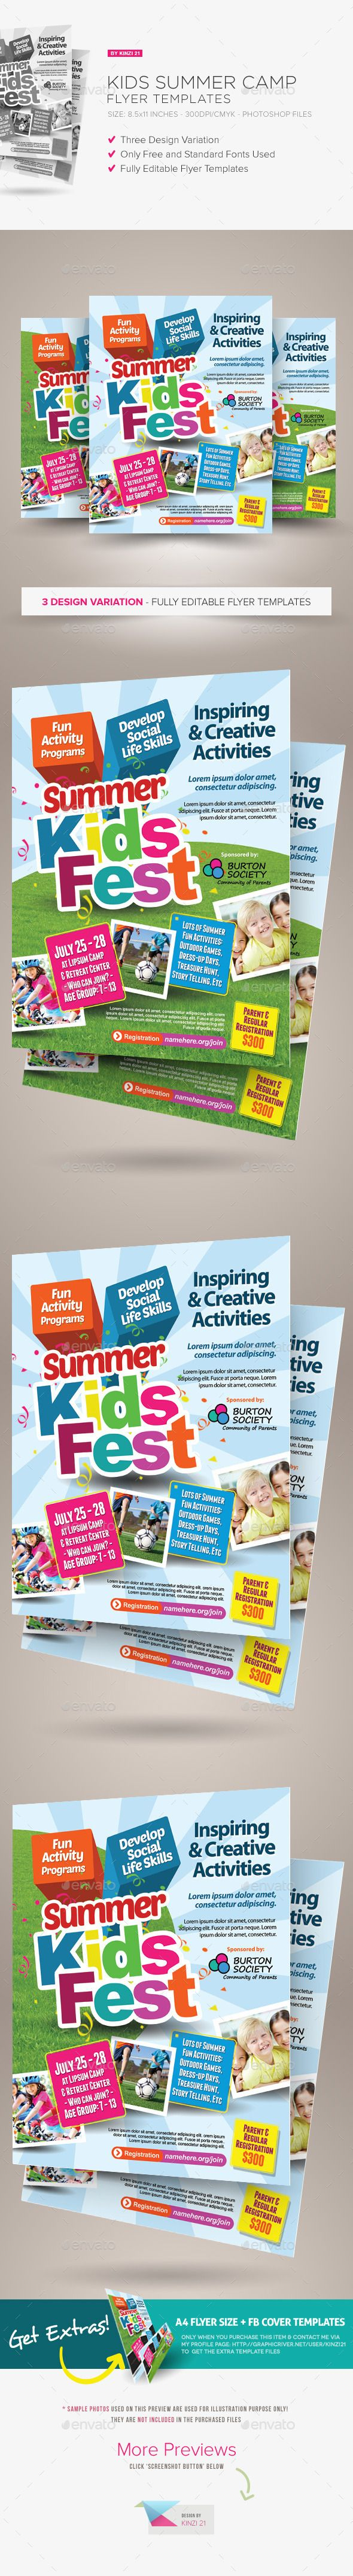 Kids Summer Camp Flyers.  activity, ad, adventure, advert, advertisement, boys, camp, child, children, class, community, day, easter, family, flyer, fun, girls, holiday, kid, kids, leaflet, night, pamphlet, poster, program, recreation, sport, summer